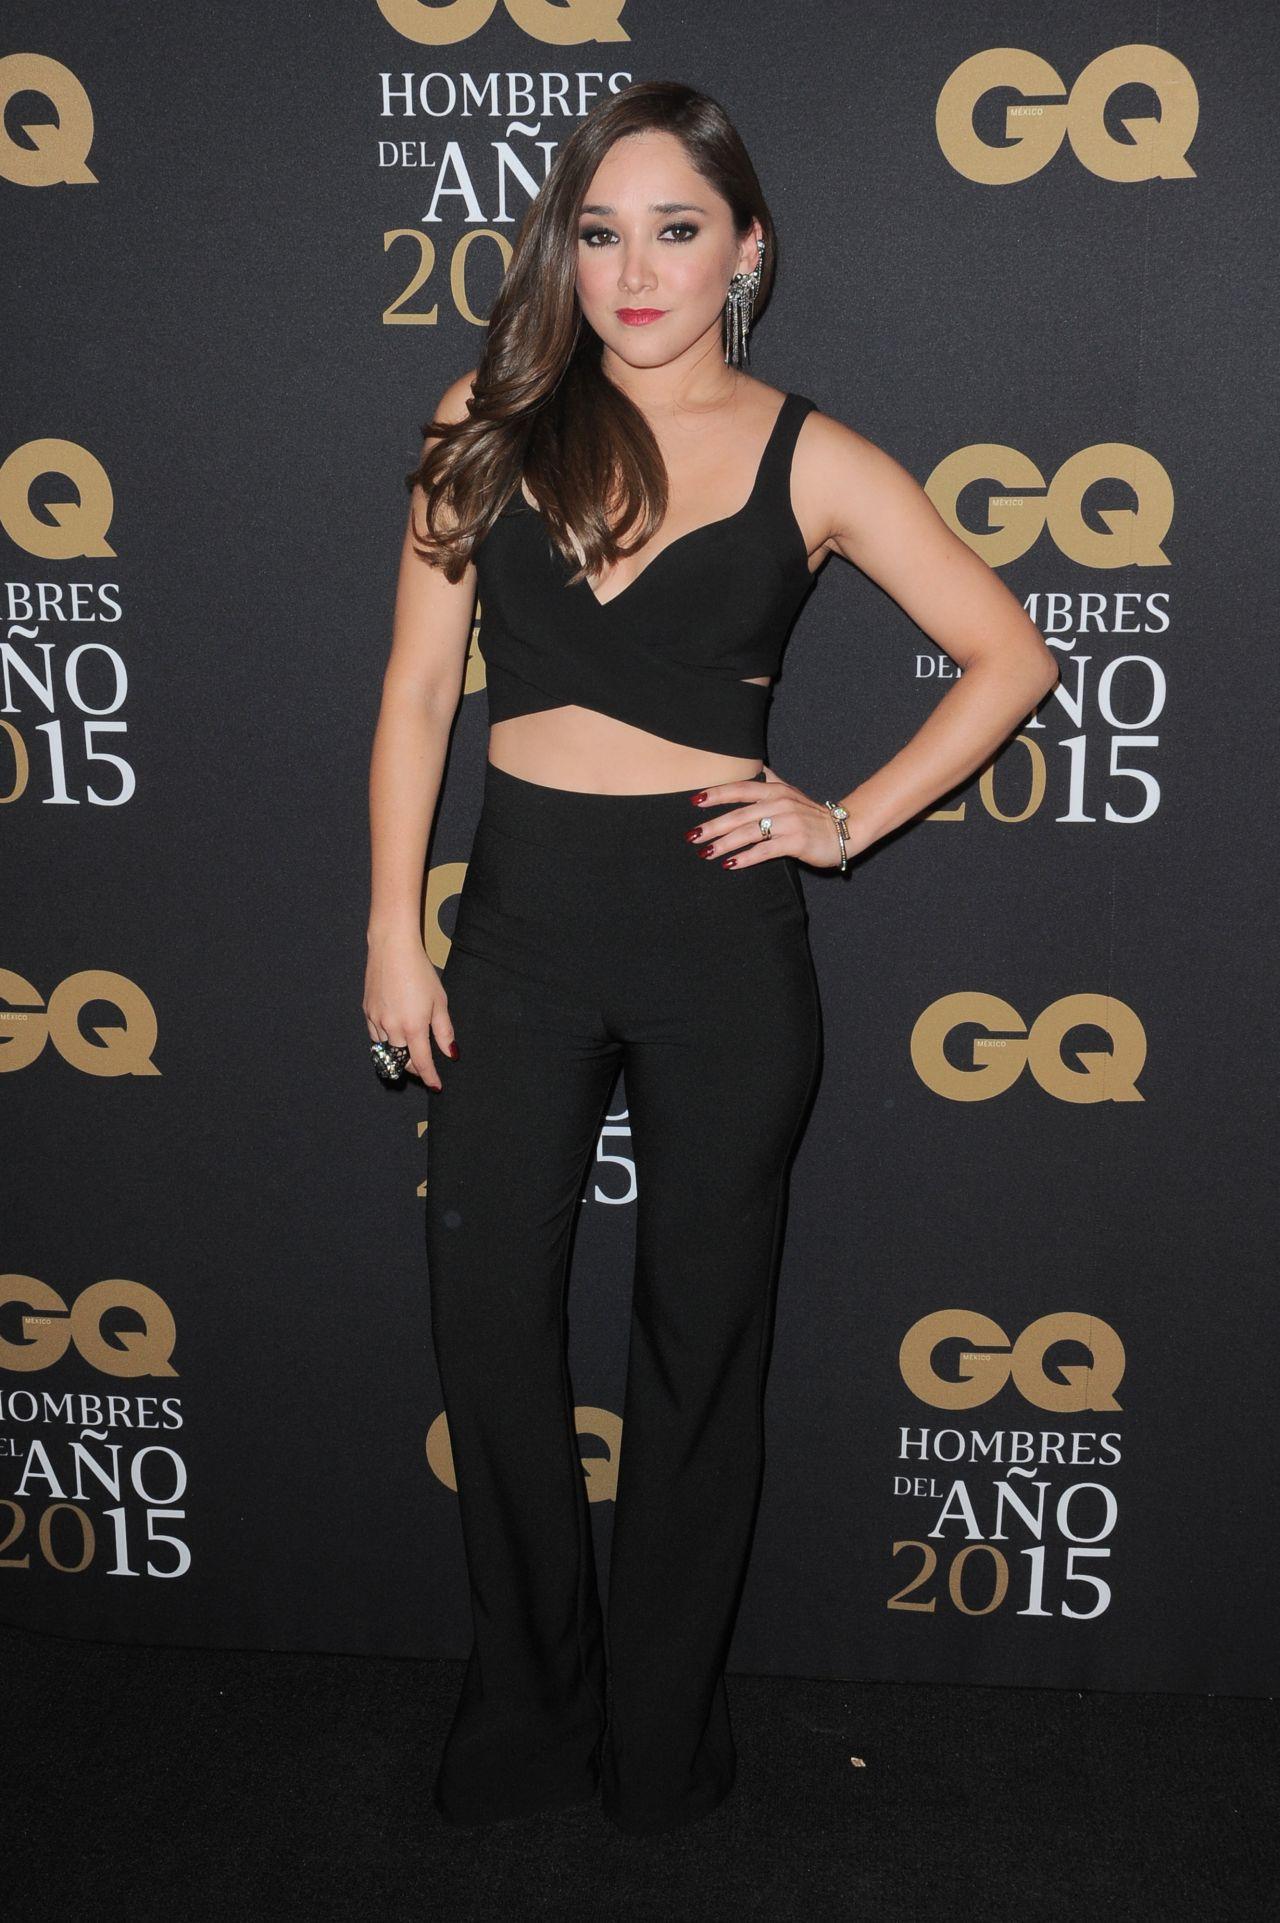 Sherlyn Gonzalez Gq Men Of The Year Awards 2015 In